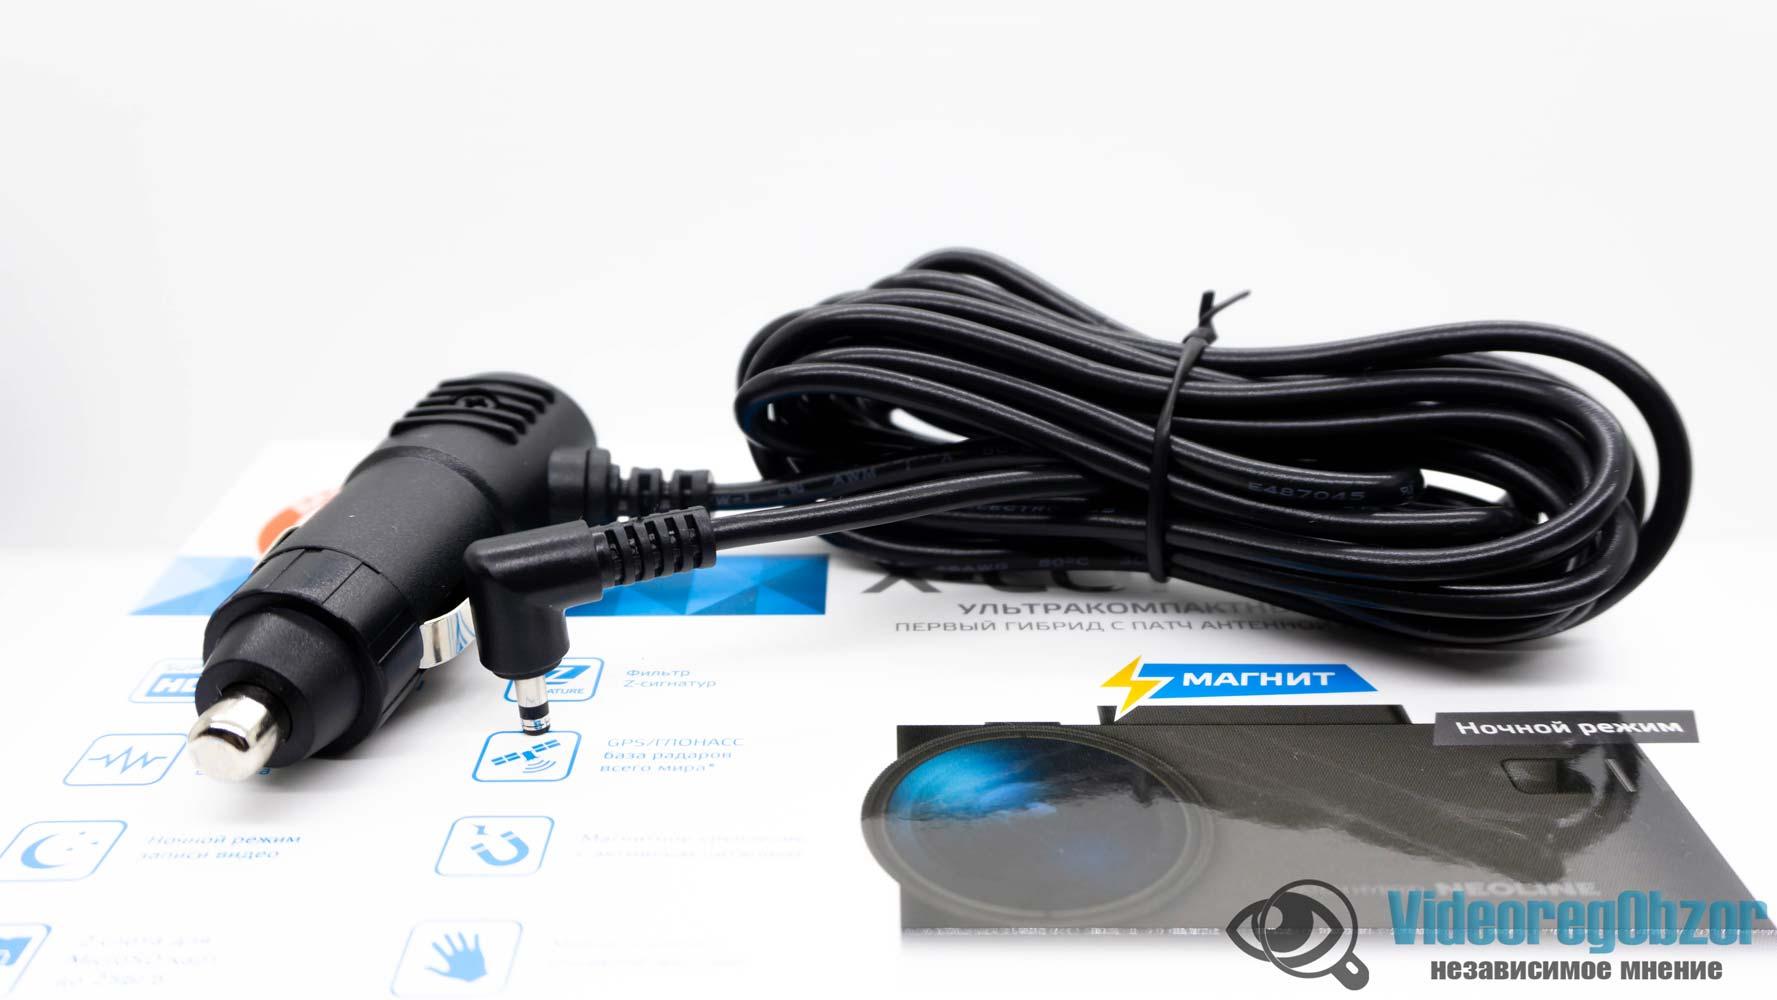 Neoline X COP 9200 обзор 10 VideoregObzor Neoline X-COP 9200: обзор видеорегистратора с радар-детектором